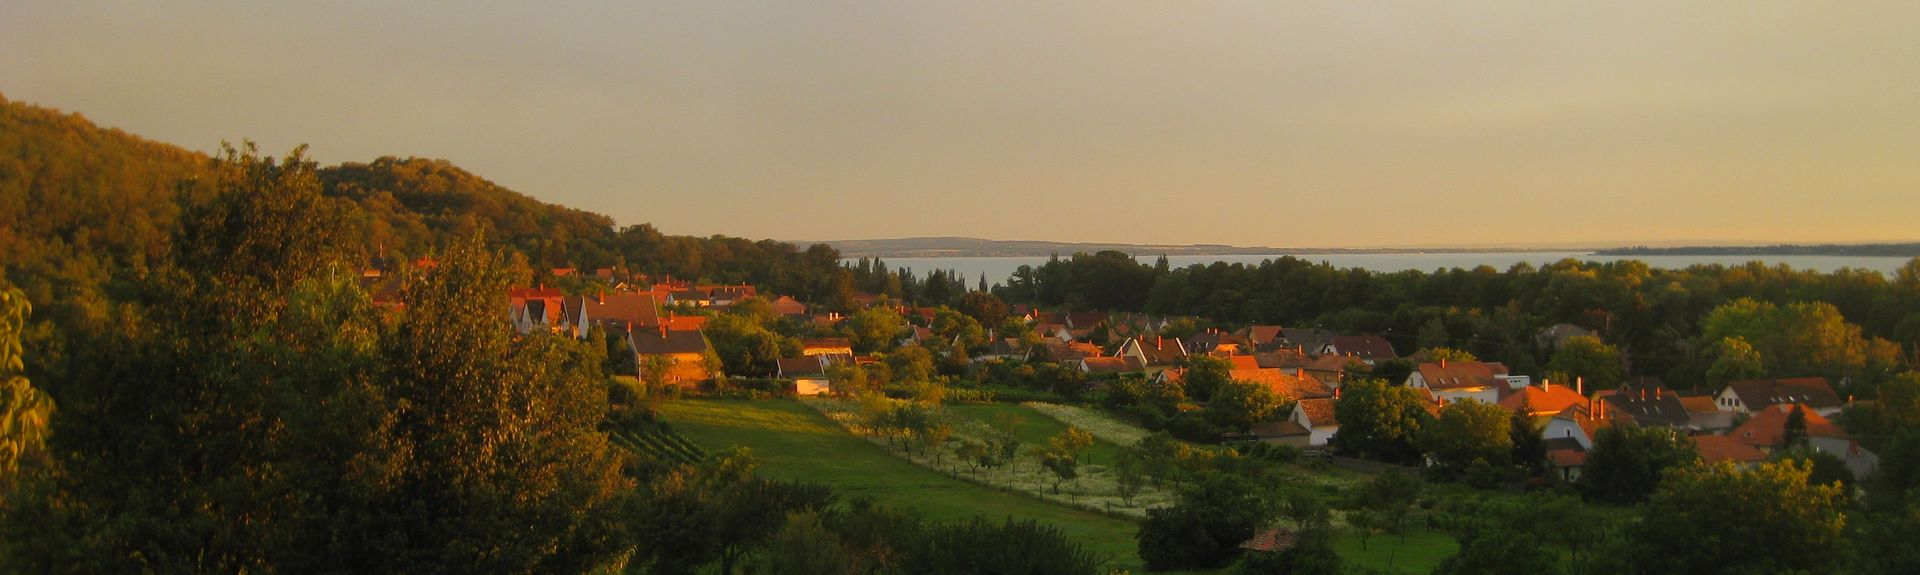 Heviz, Zala megye, Ungarn